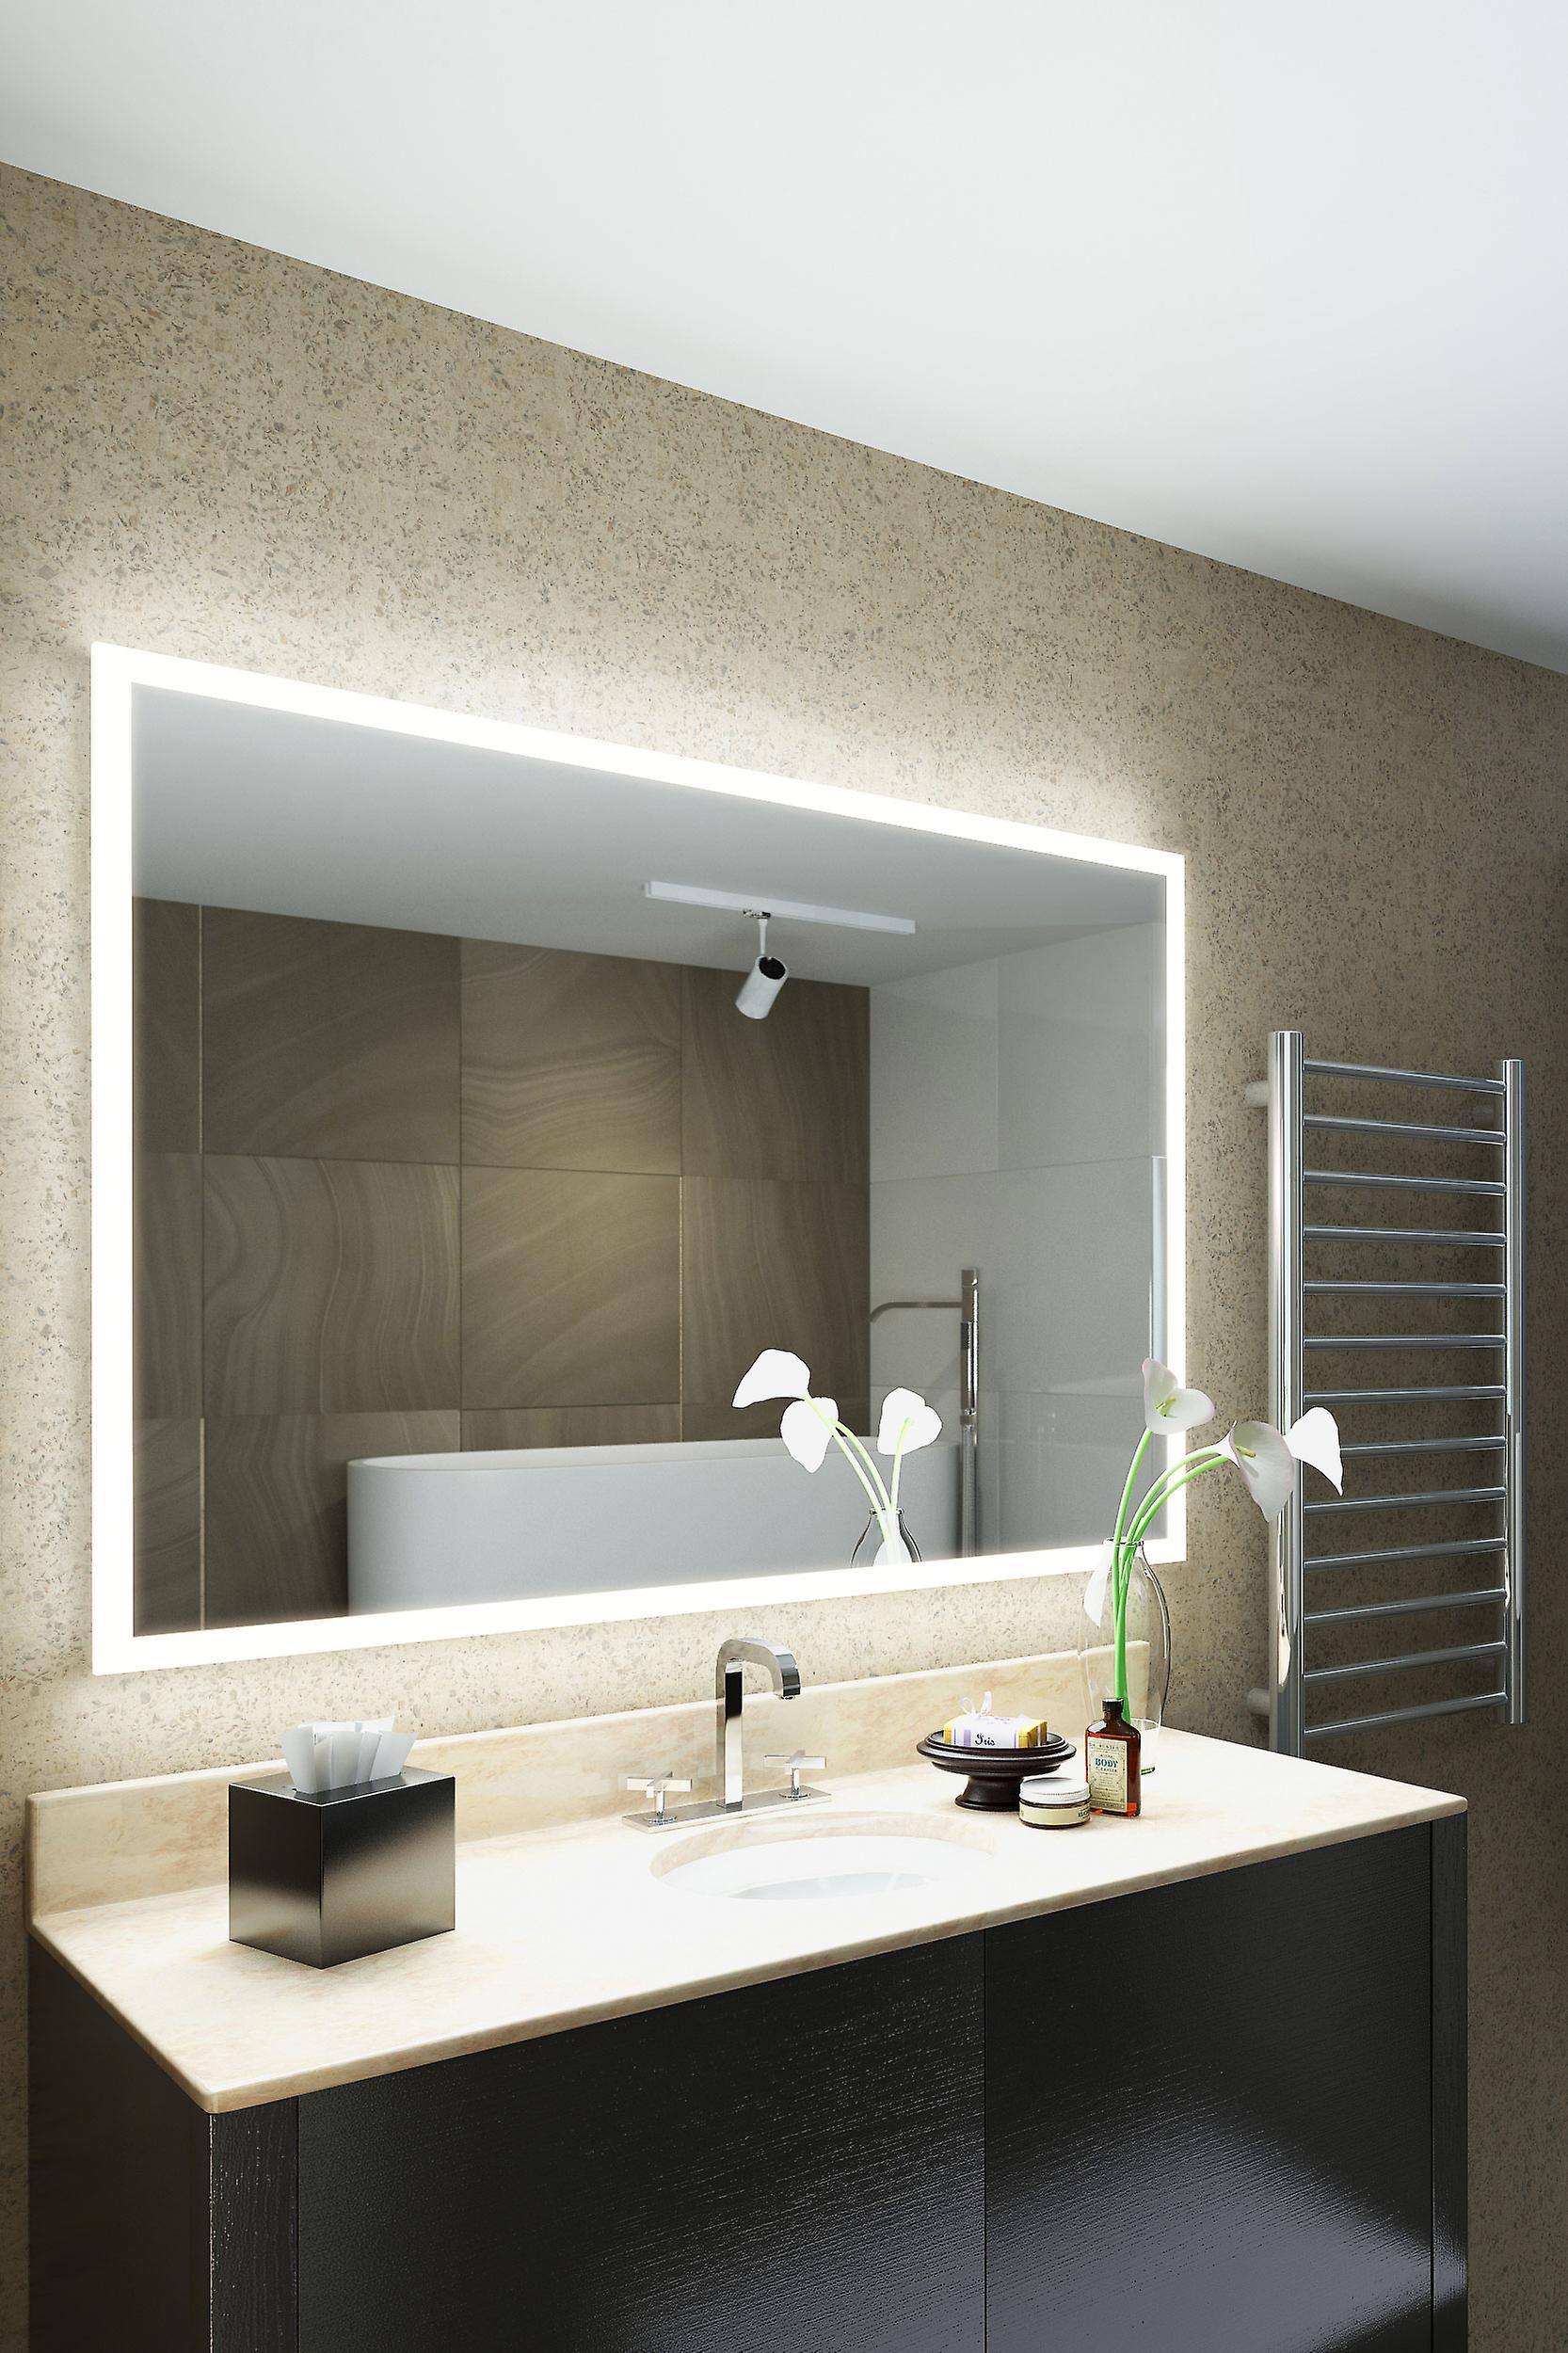 Salma Shaver Edge LED Bathroom Mirror Demister Pad & Sensor k8402h